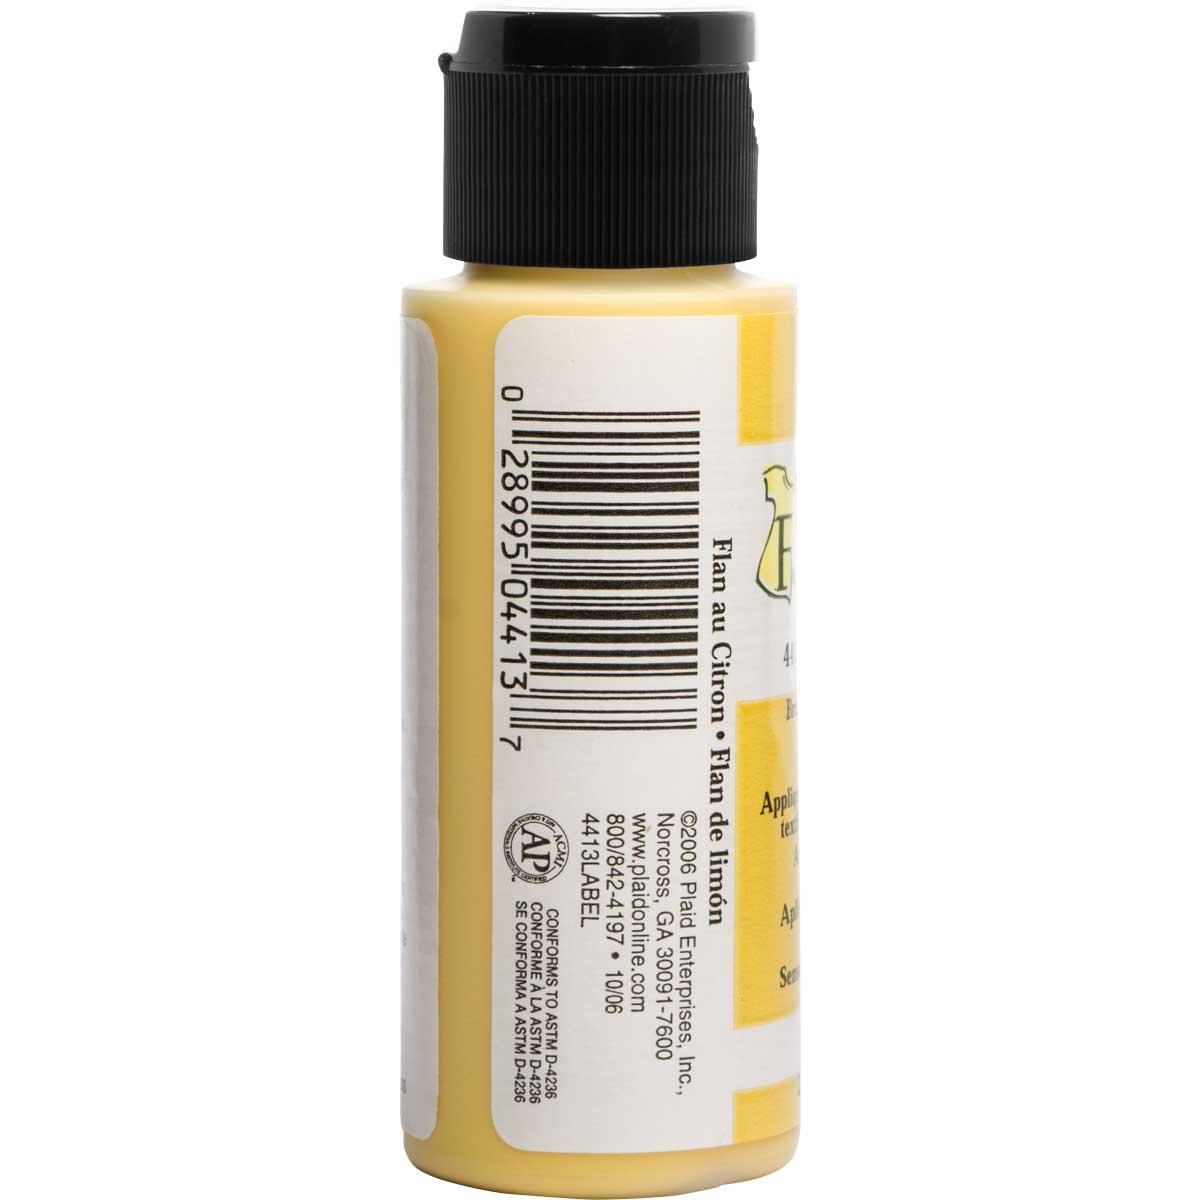 FolkArt ® Fabric™ Paint - Brush On - Lemon Custard